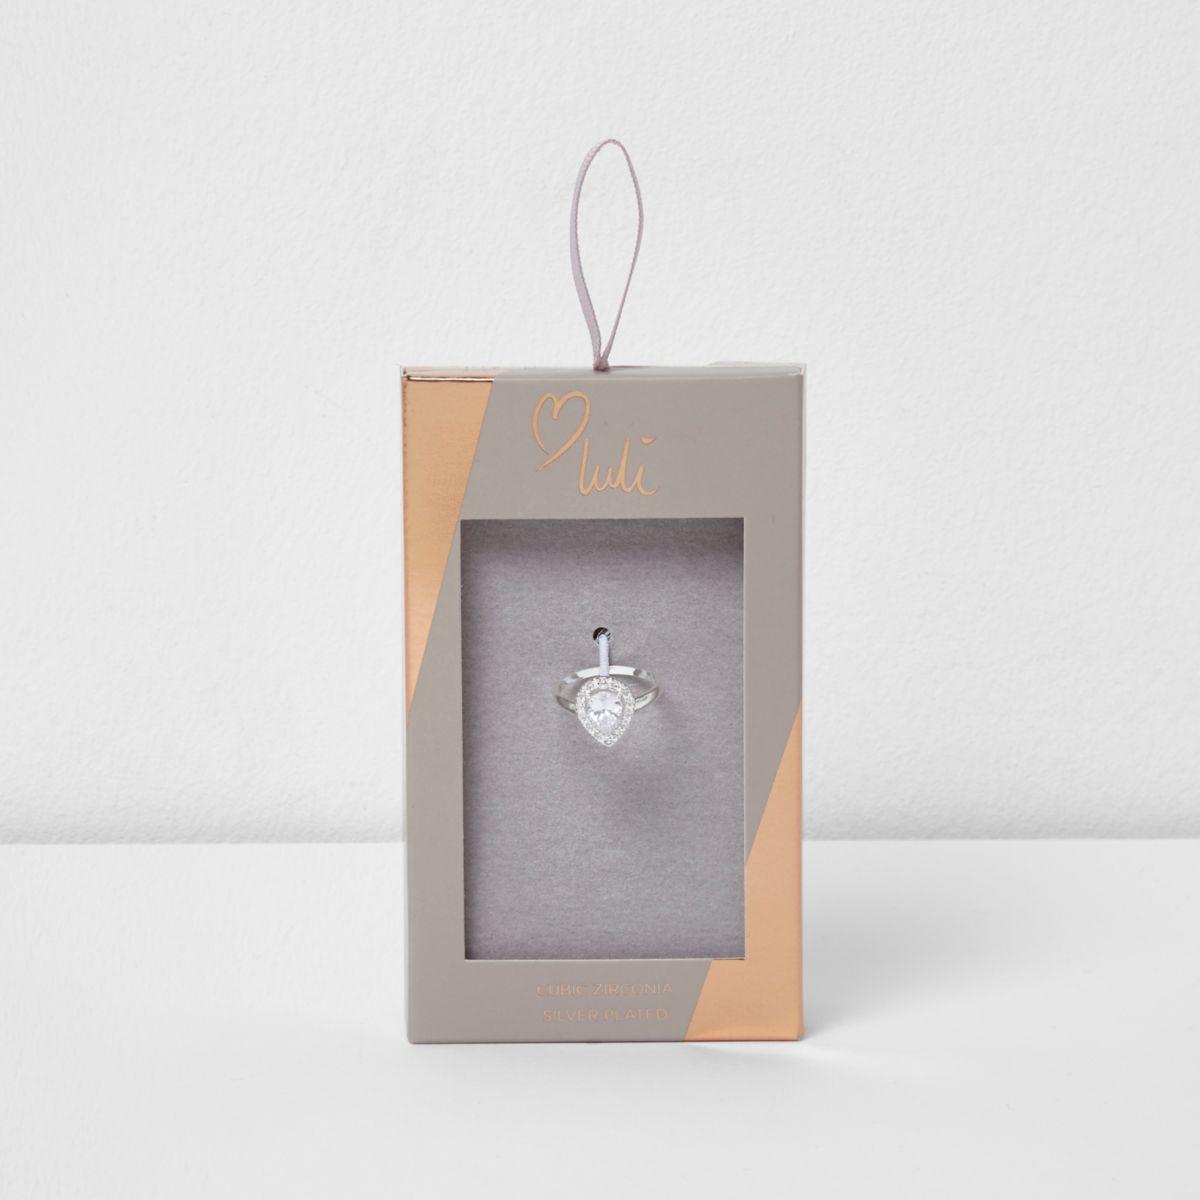 Silver plated Love Luli teardrop ring